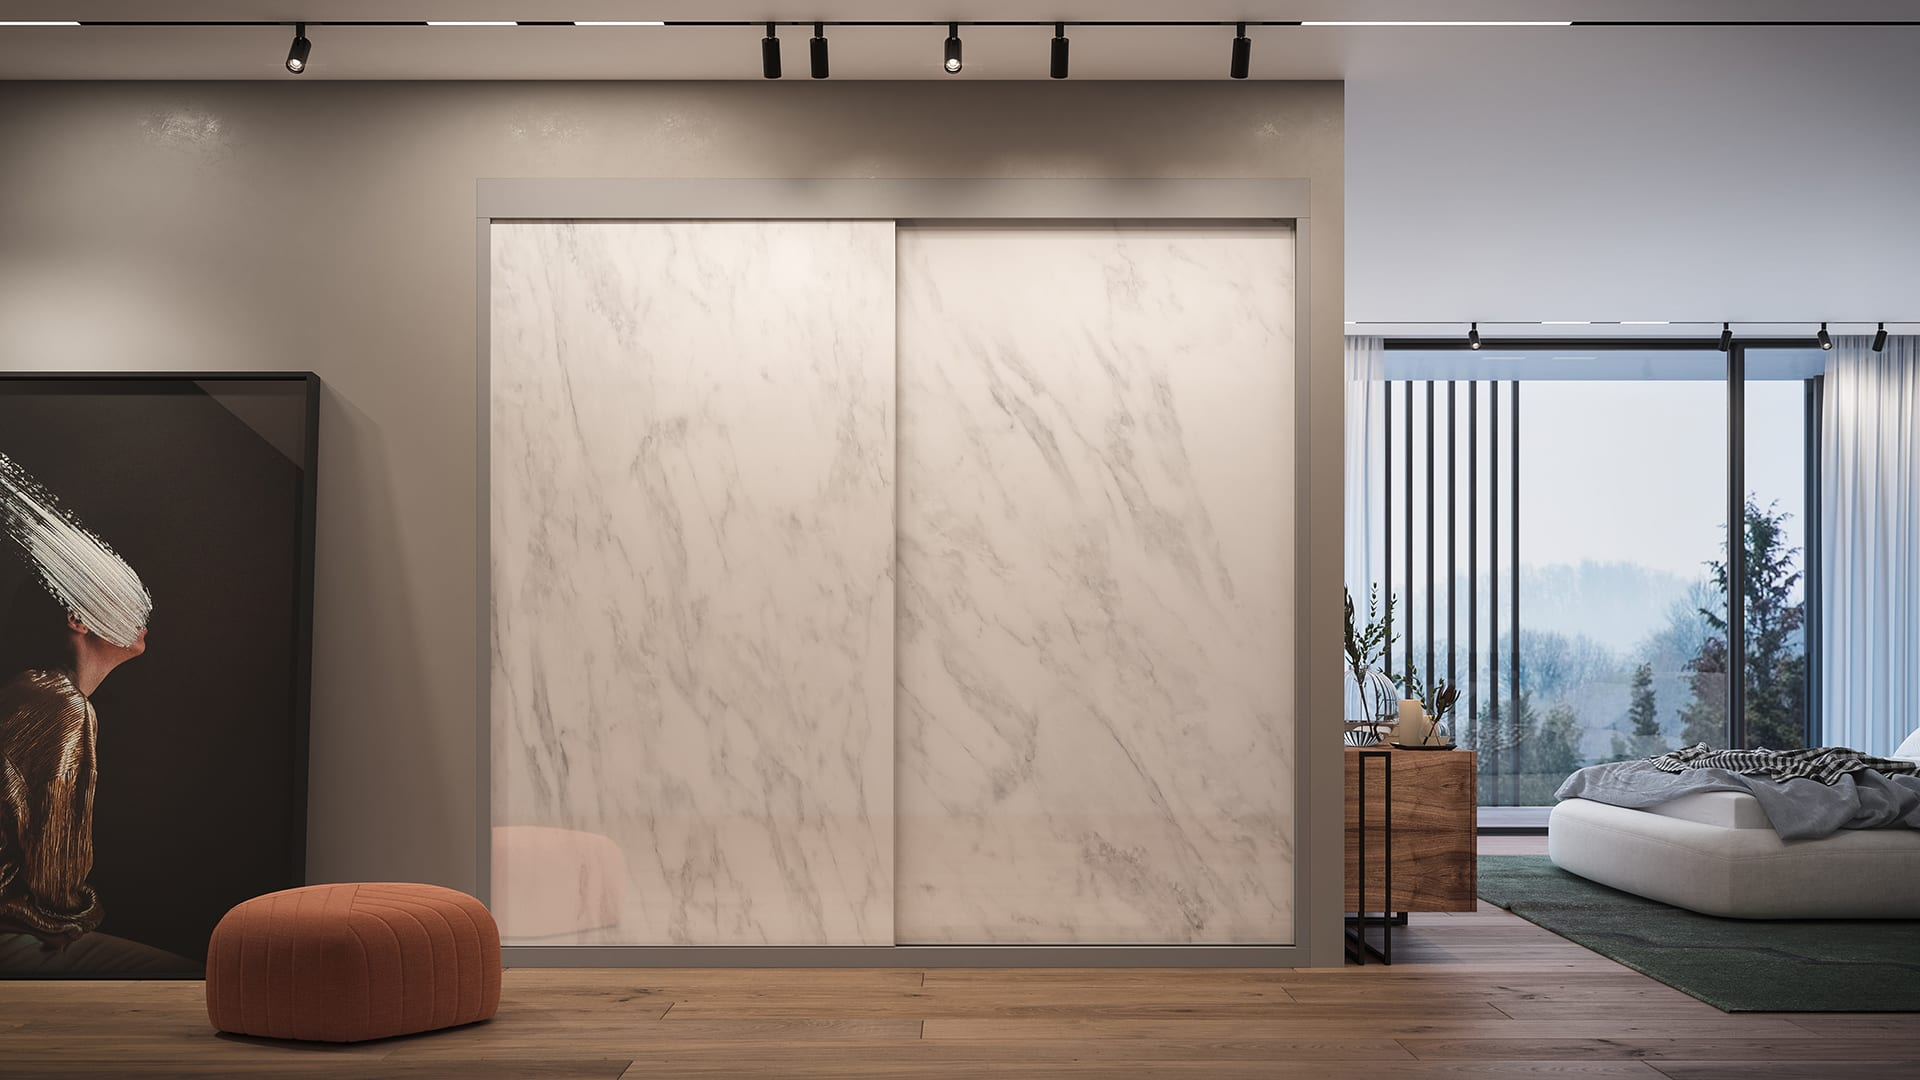 Maayan-Golan_Architectural-Visualization_product-visualization_AGAM-cloests_sliding-door-closet_01